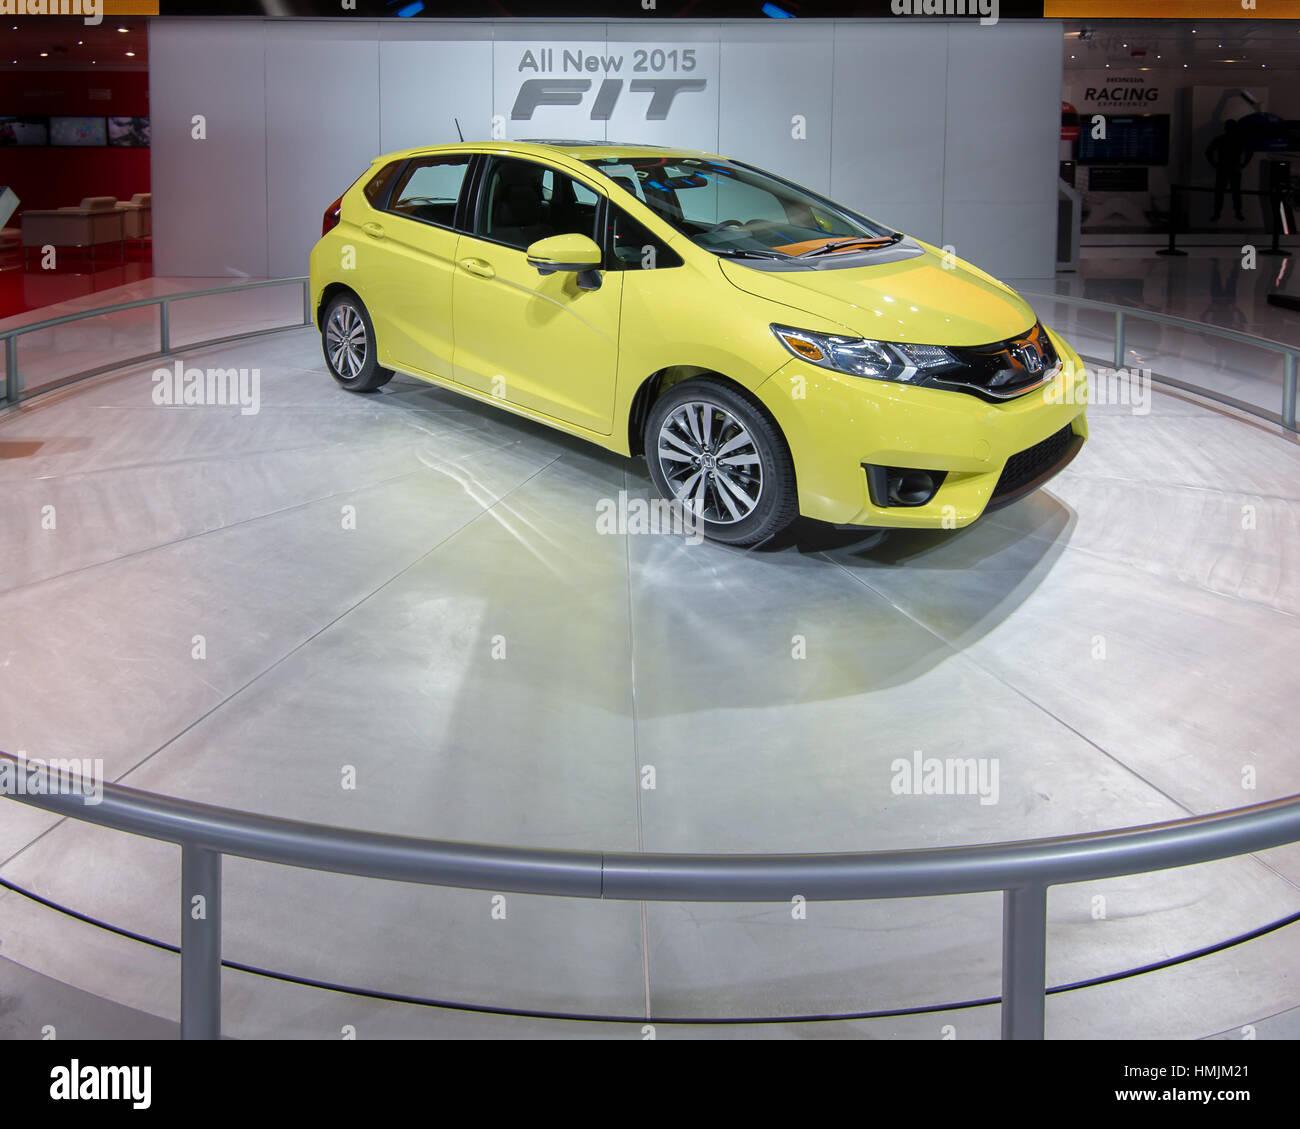 Honda Fit Stock Photos Honda Fit Stock Images Alamy